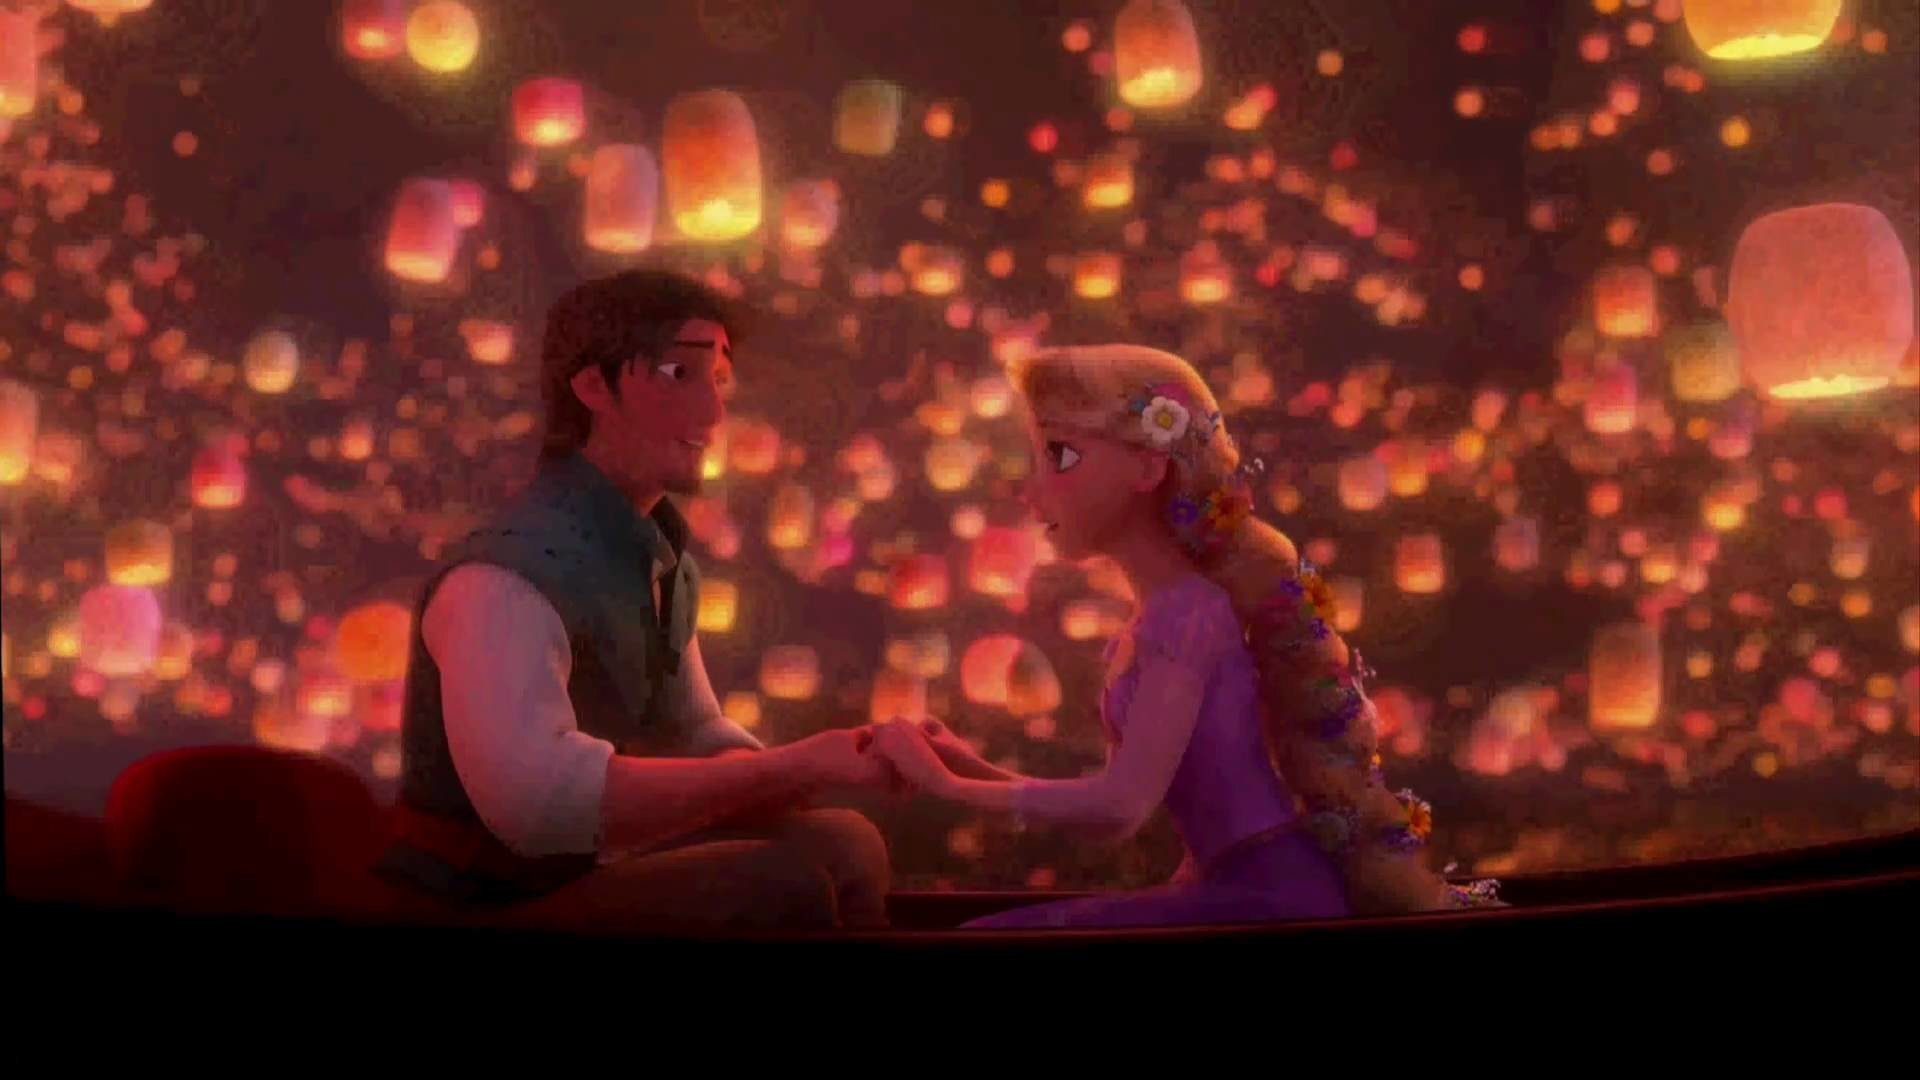 Rapunzel Wallpaper HD (70+ images)